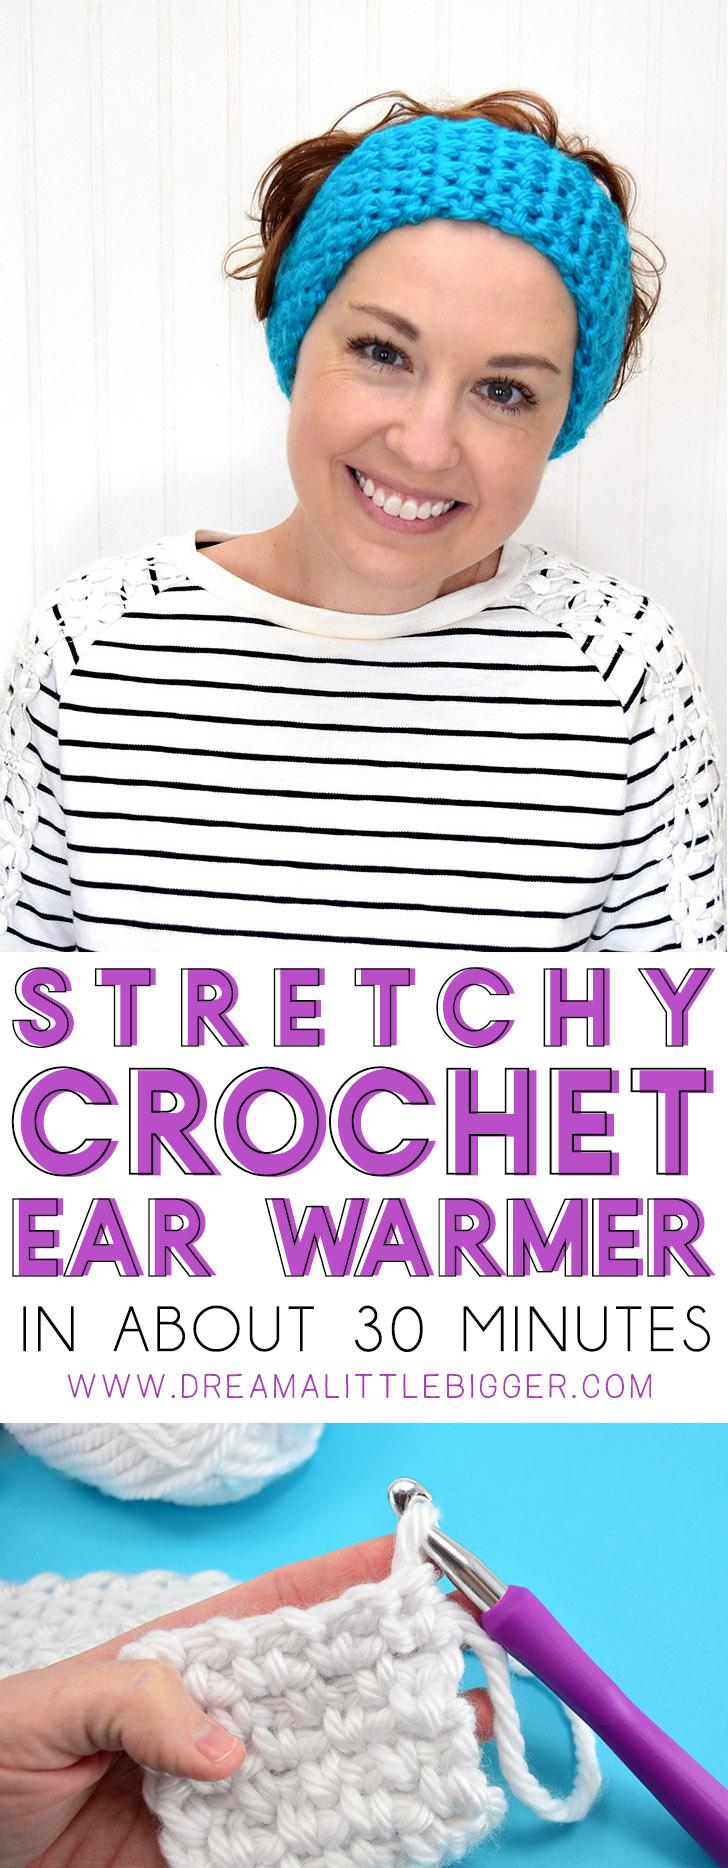 How to Crochet a Stretchy Ear Warmer